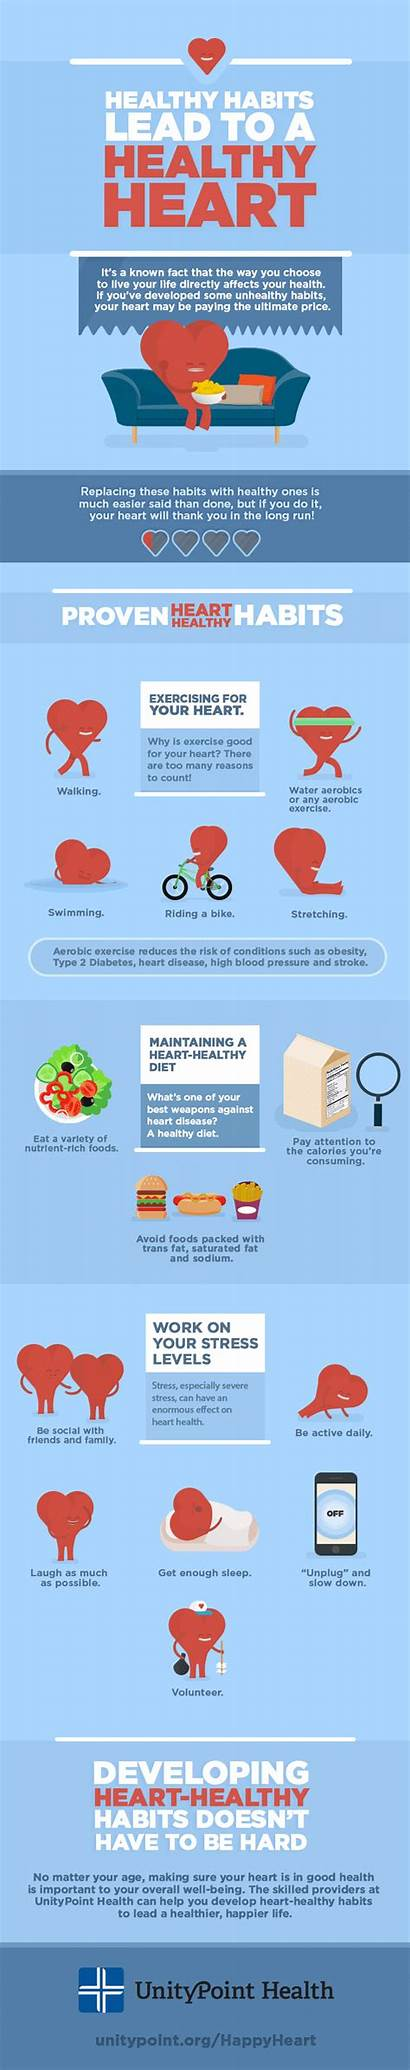 Heart Healthy Habits Health Disease Prevent